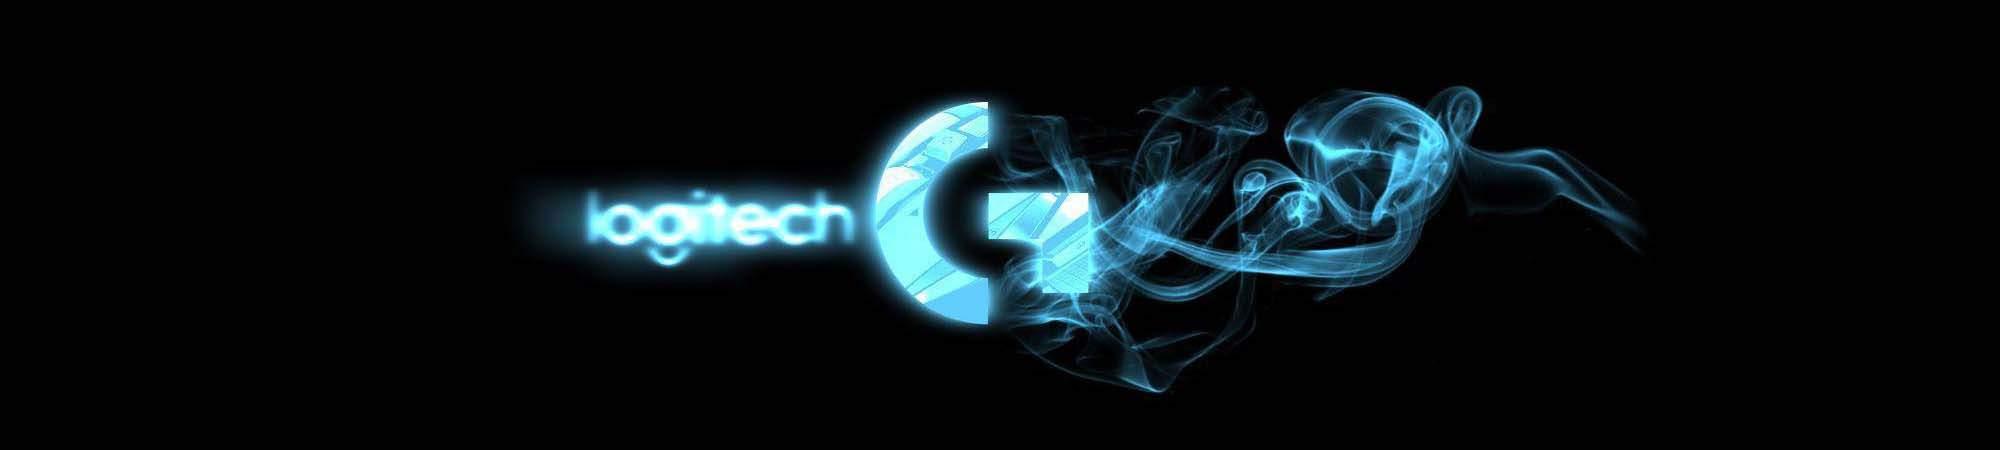 Logitech Brand page banner